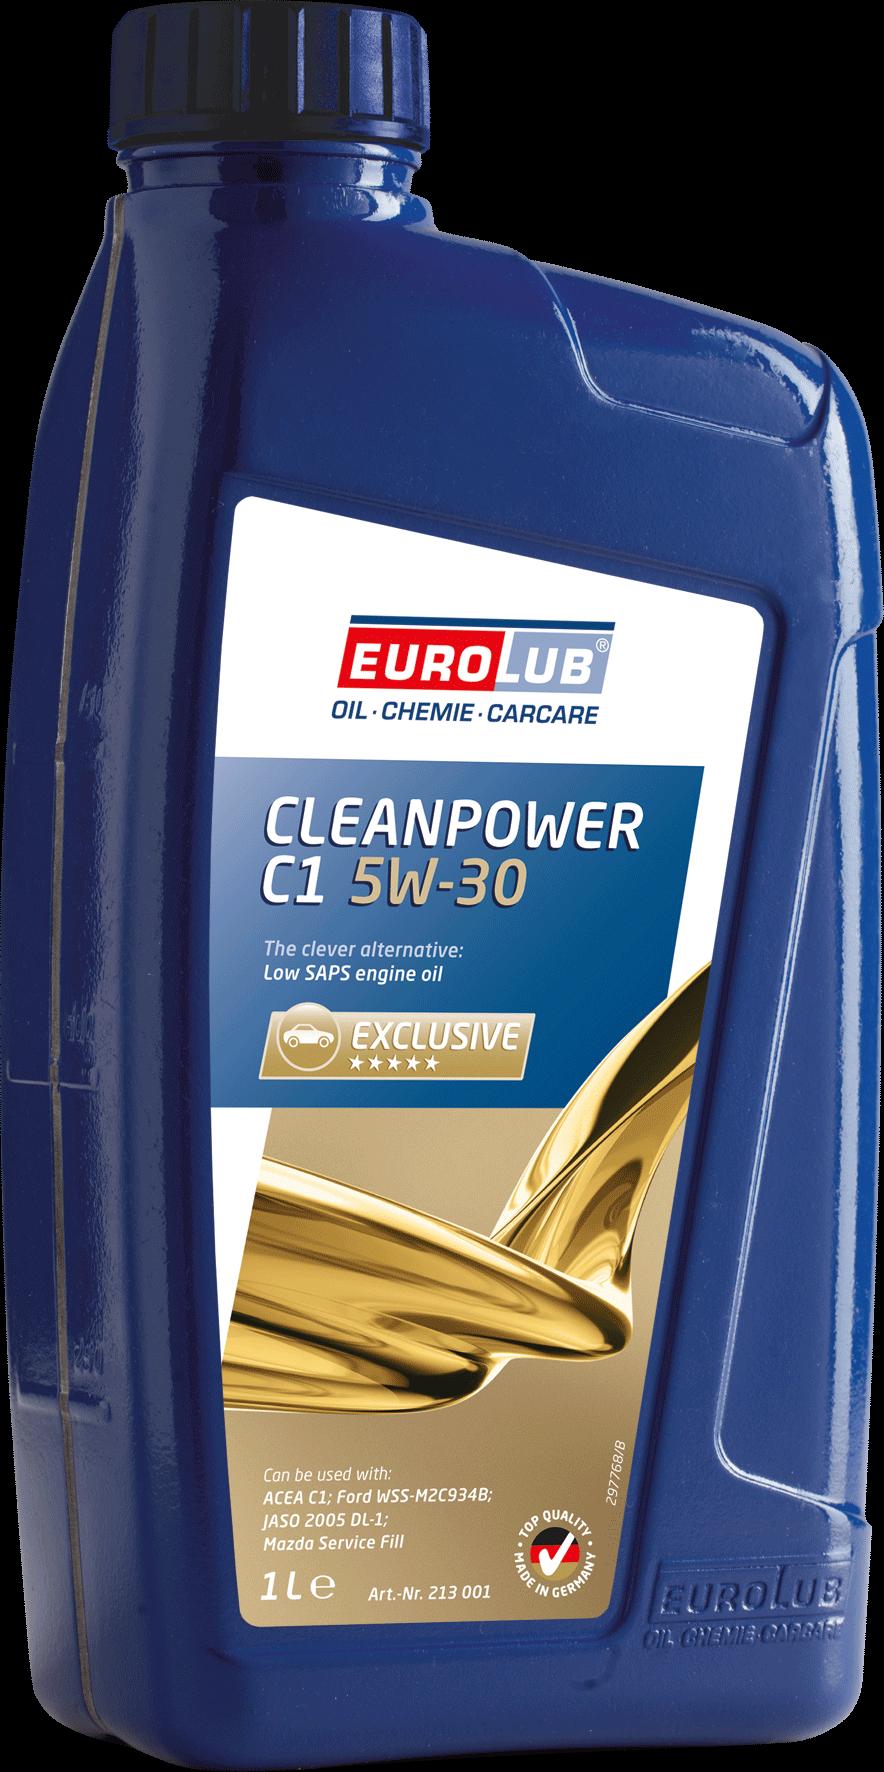 EUROLUB CLEANPOWER C1, SAE 5W/30, (синтетическое, Mid SAPS) , 1л